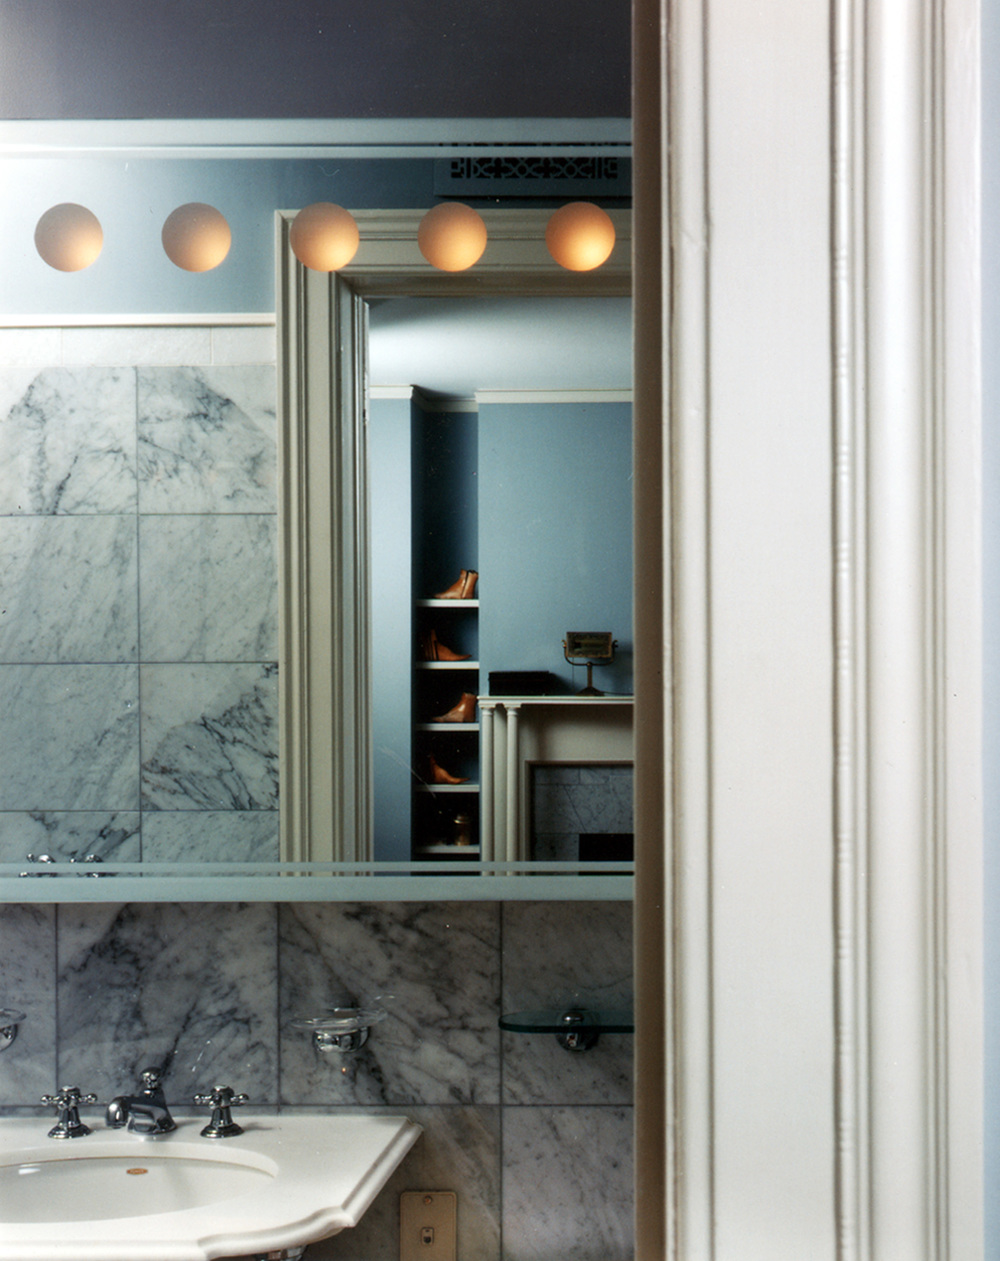 Mystery Point - Interior - Bathroom Sink.jpg